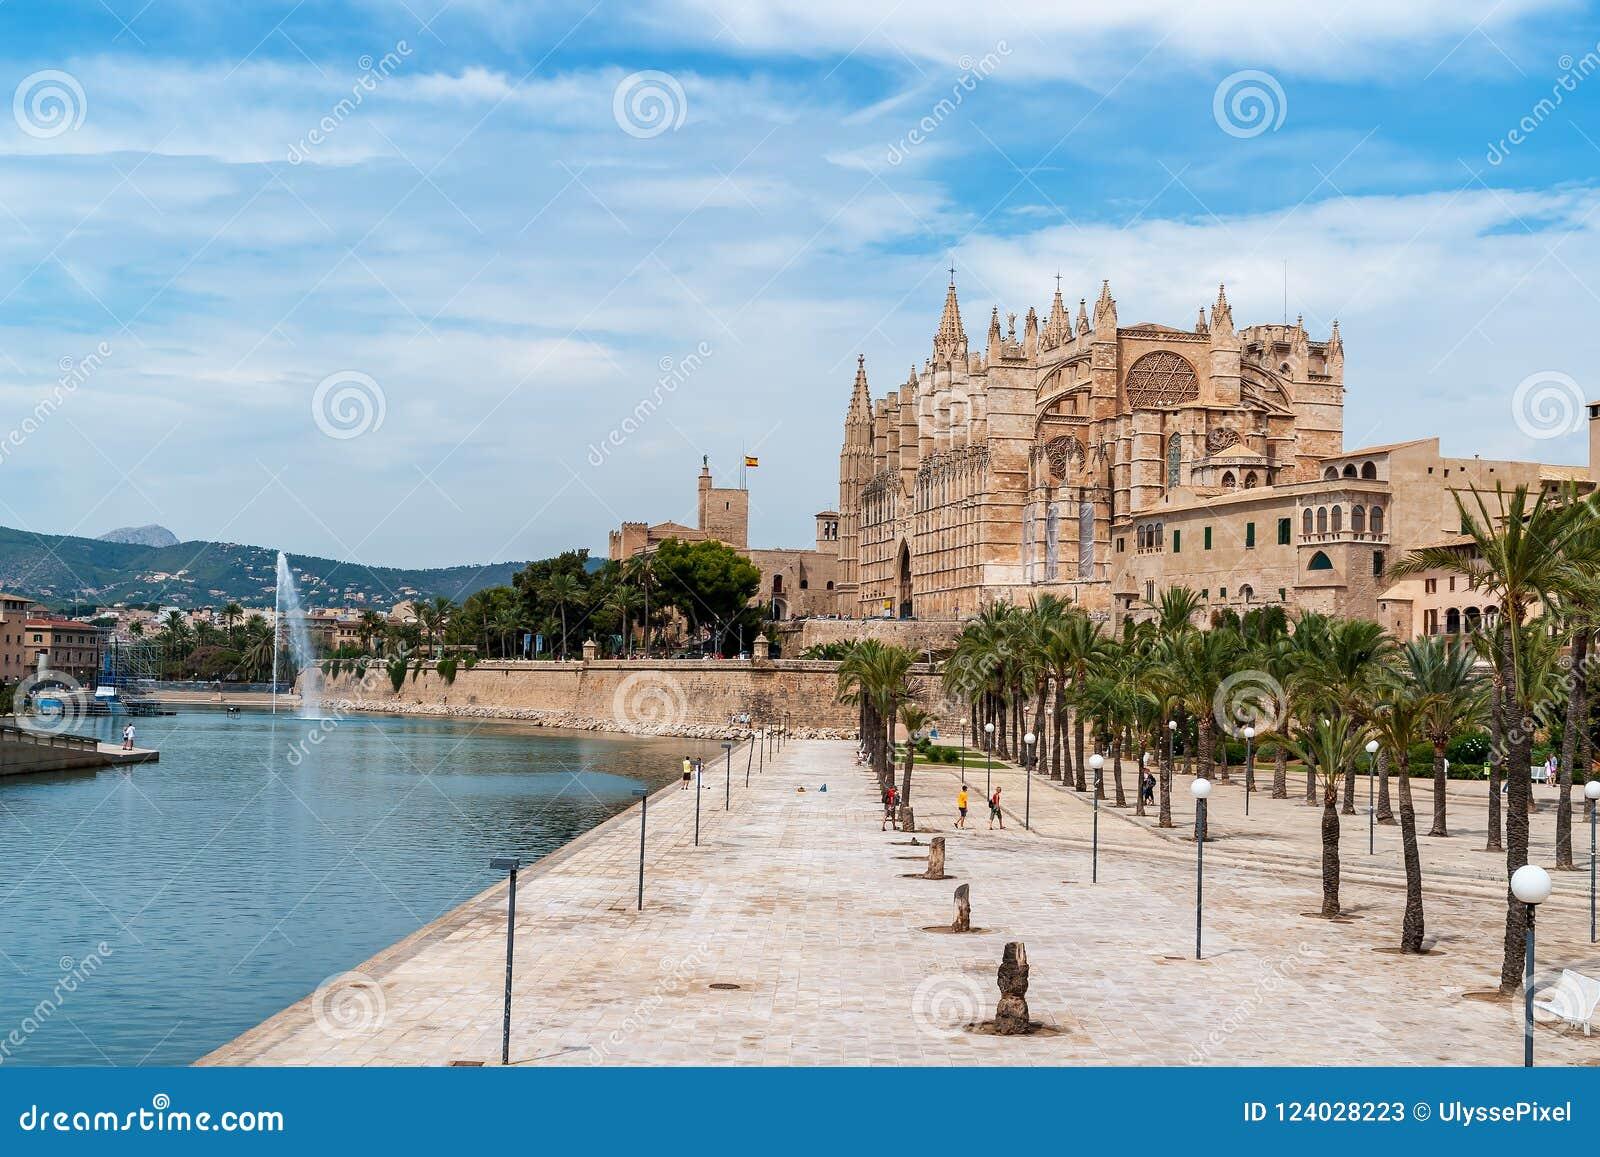 La Seu, domkyrkan av Palma de Mallorca - Balearic Island, Spanien